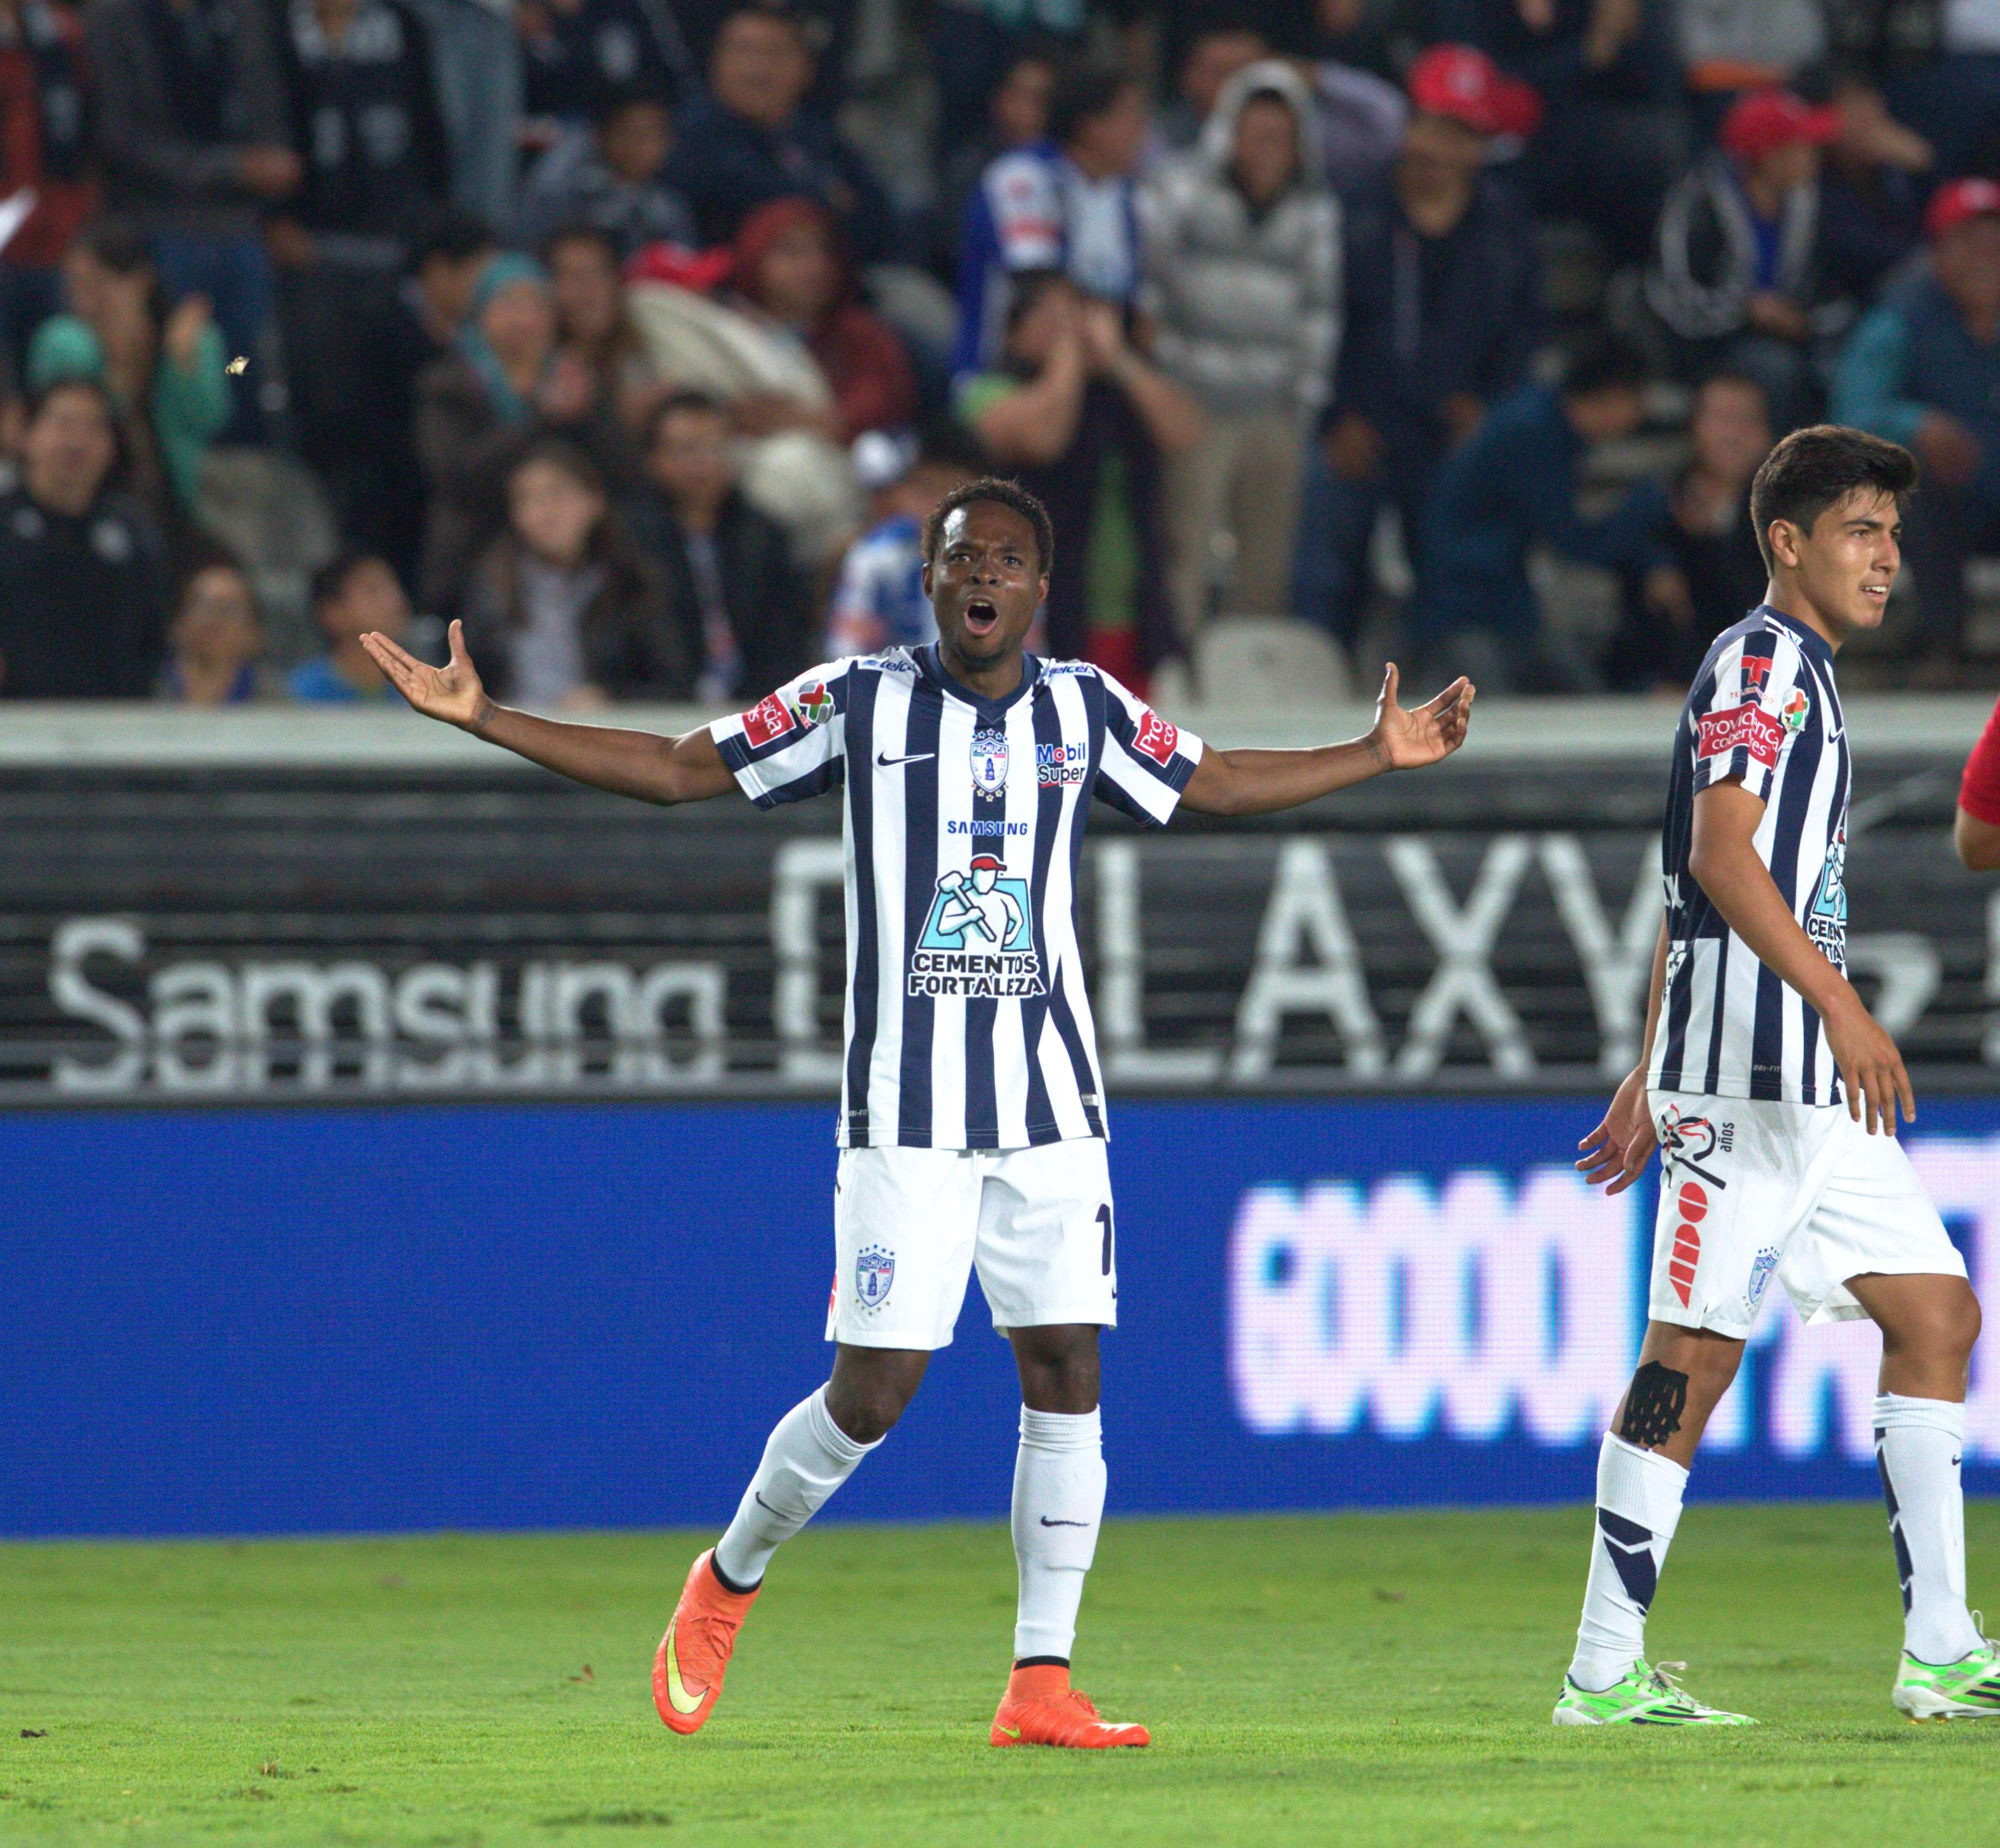 Pachuca entró con un gol de último minuto a la Liguilla. Foto: Mexsport